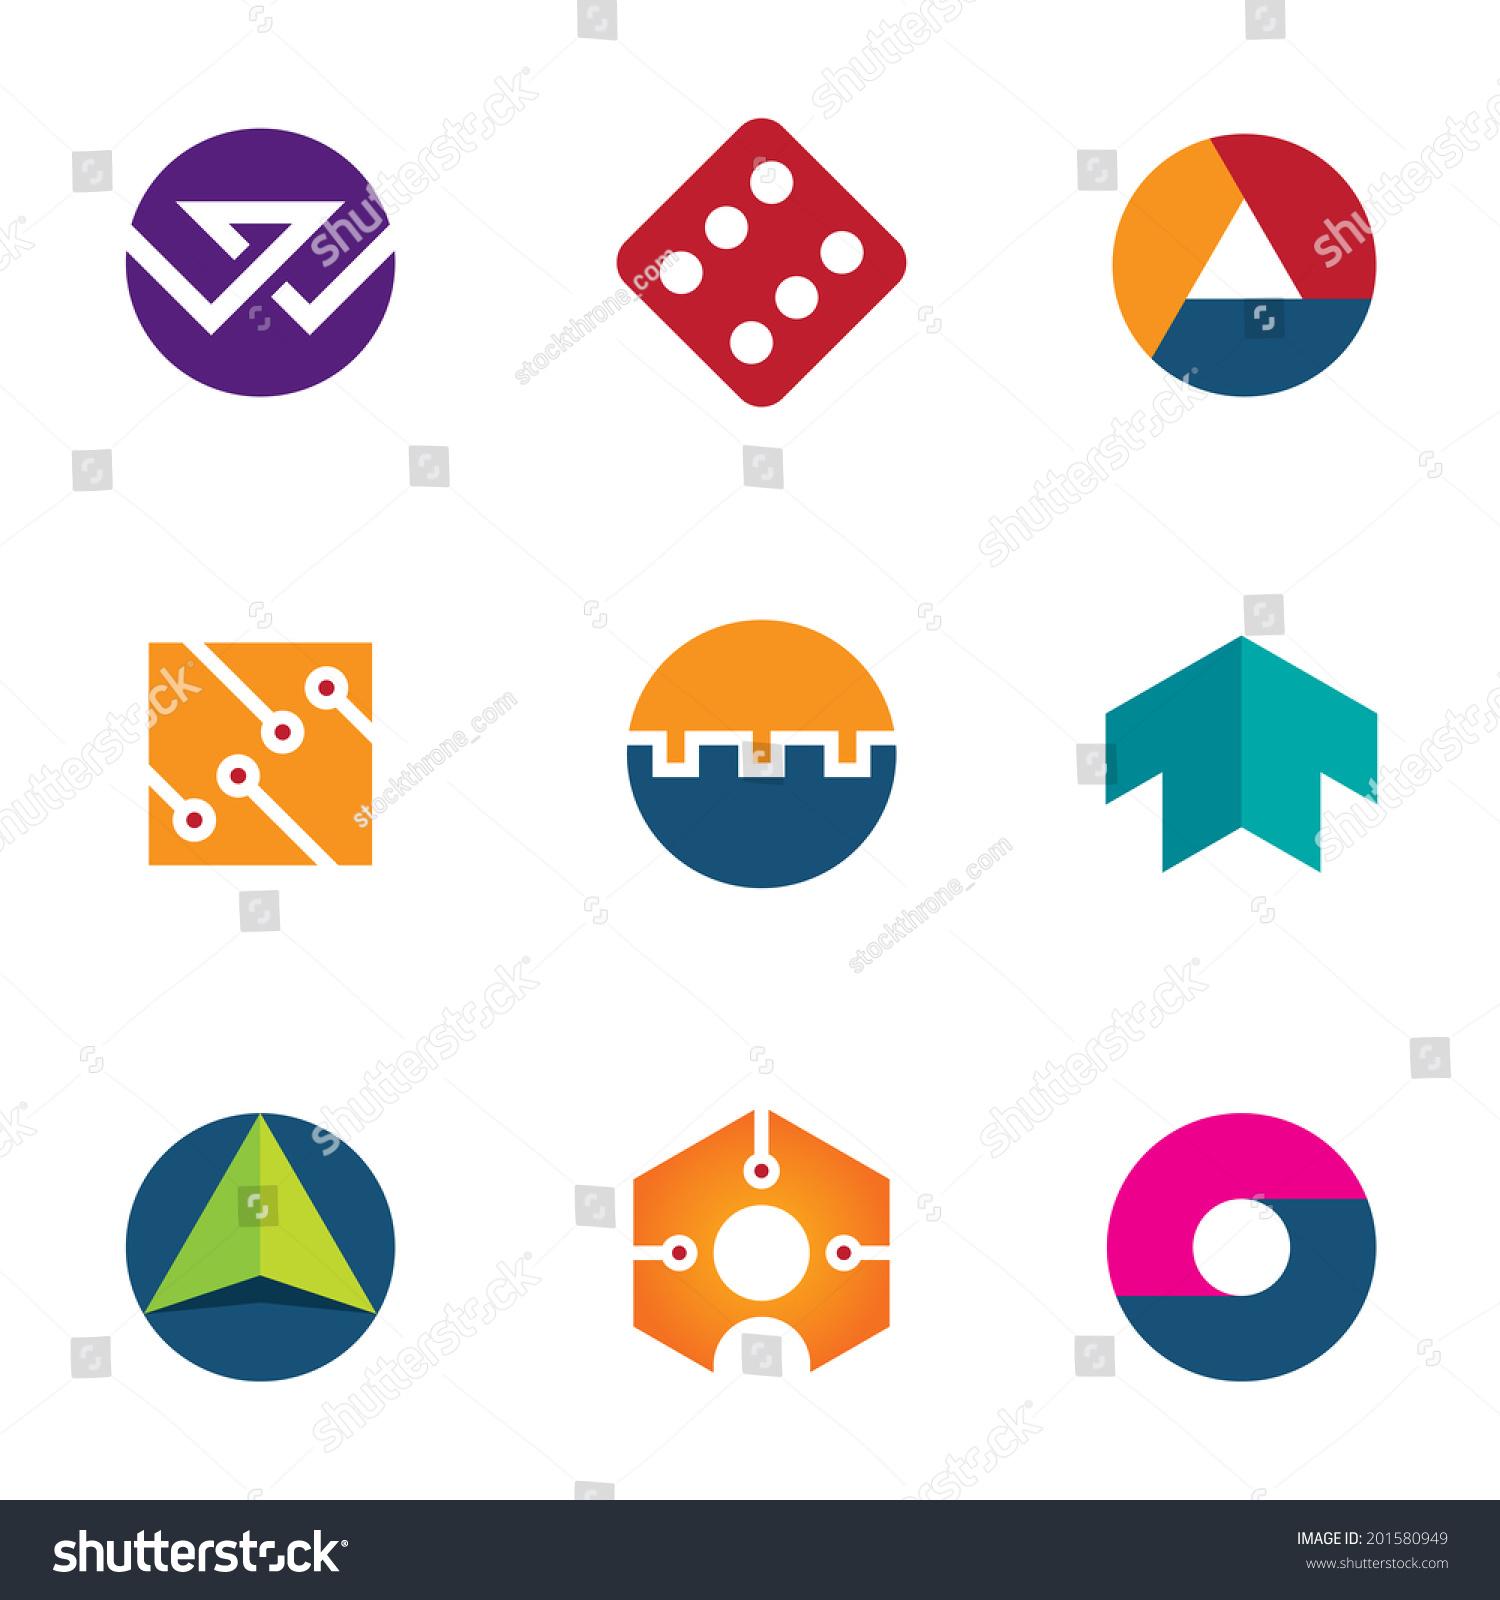 Technology Success Luck Foundation Logo Arrow Boost Up Icon Set Stock Vector Illustration 201580949 : Shutterstock